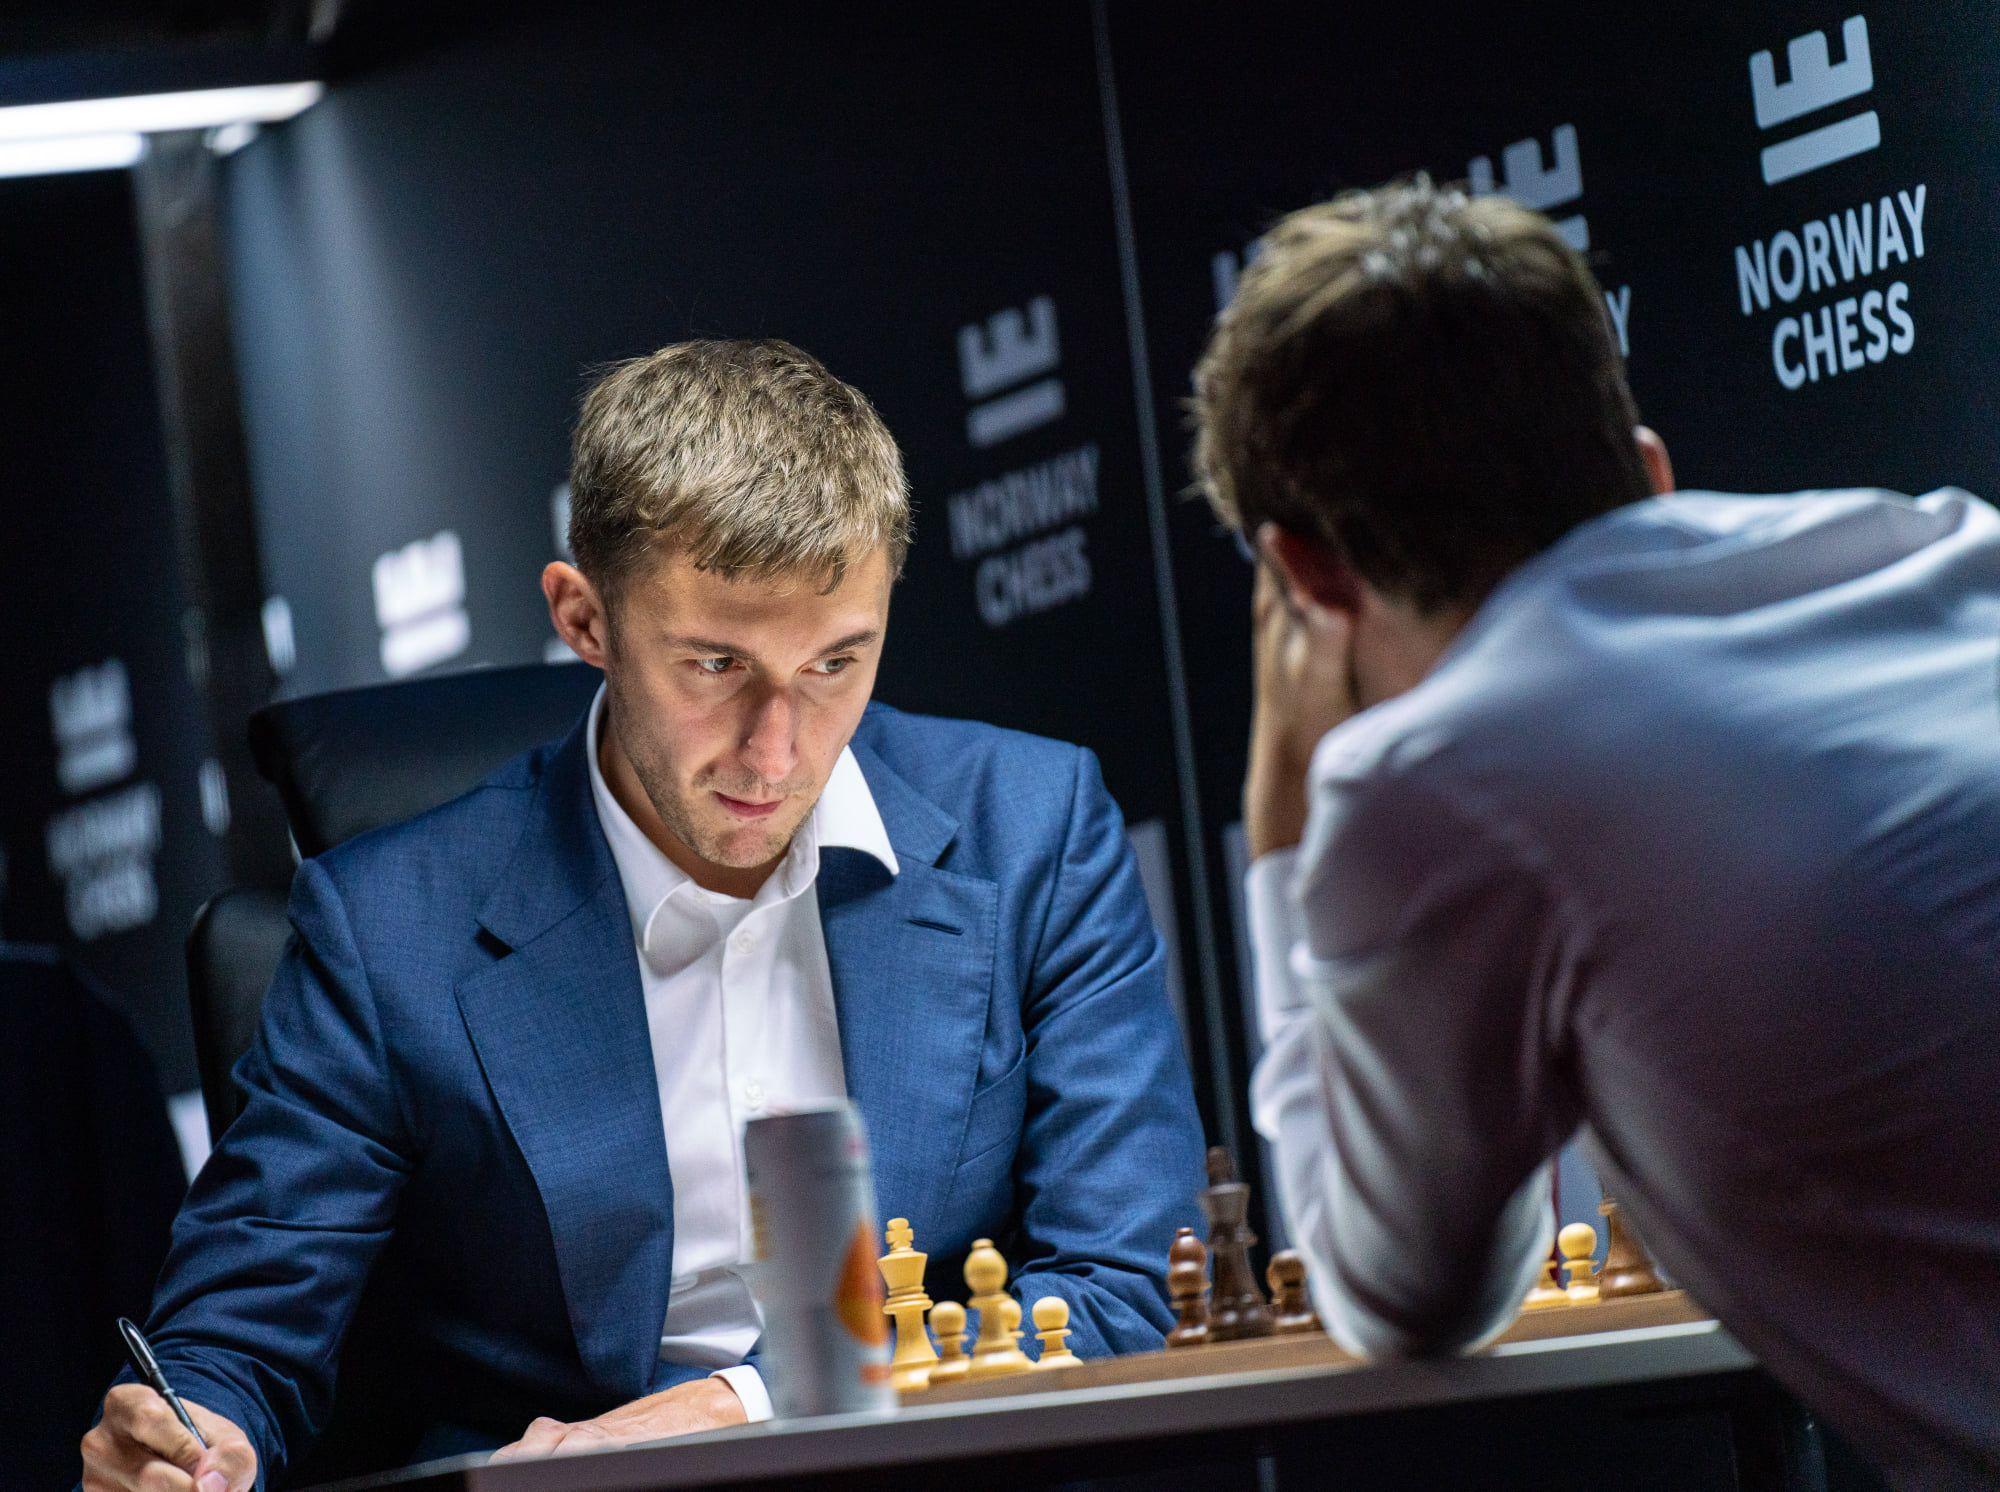 Karjakin đối đầu với Magnus Carlsen tại siêu giải Na Uy